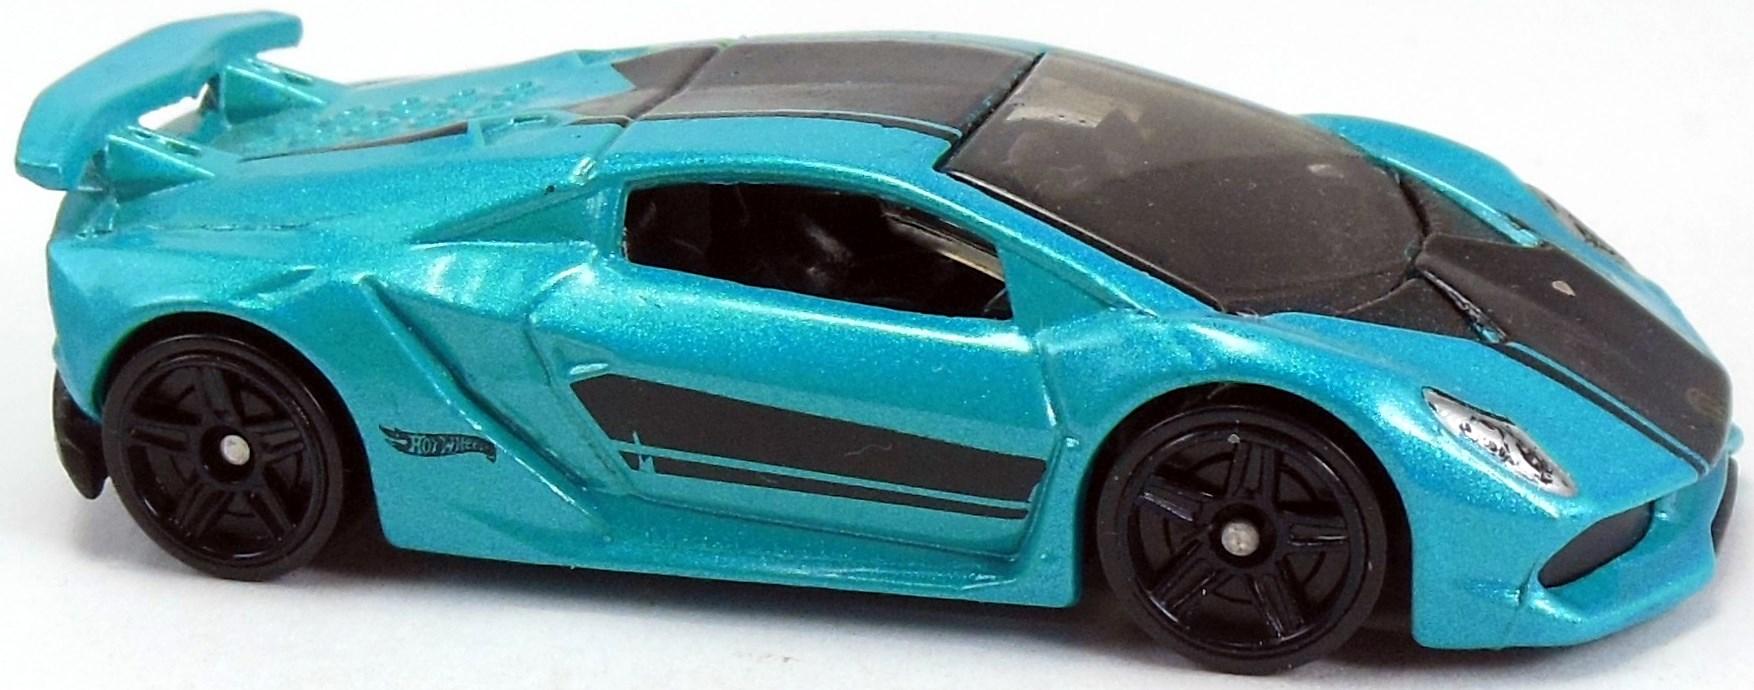 Lamborghini Sesto Elemento 67mm 2014 Hot Wheels Newsletter